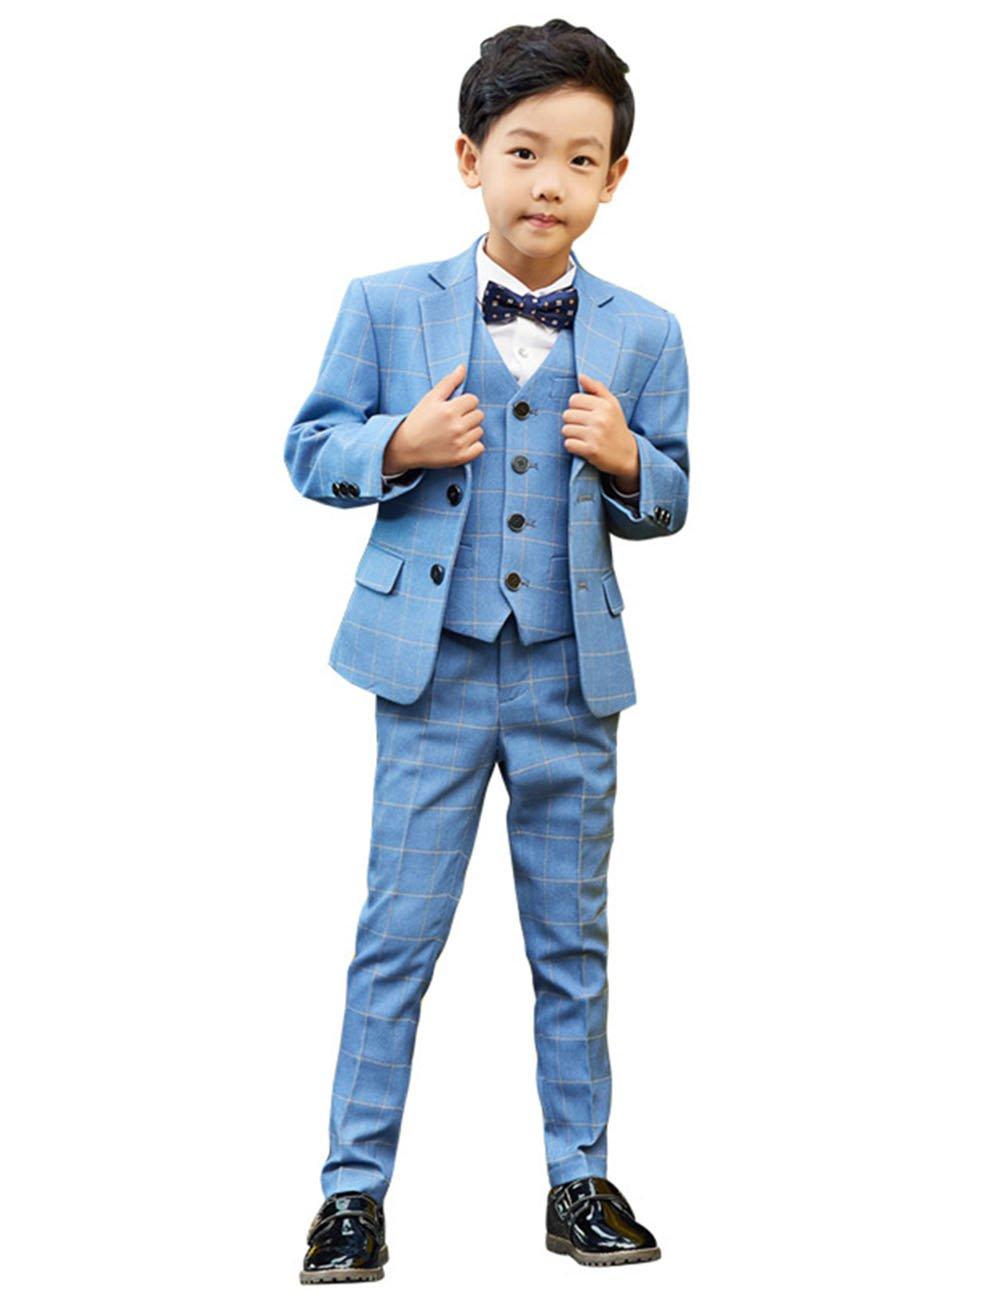 Beautydress Boys 5 Pieces Plaid Formal Suit Slim Fit Tuxedo Set Dresswear BP228